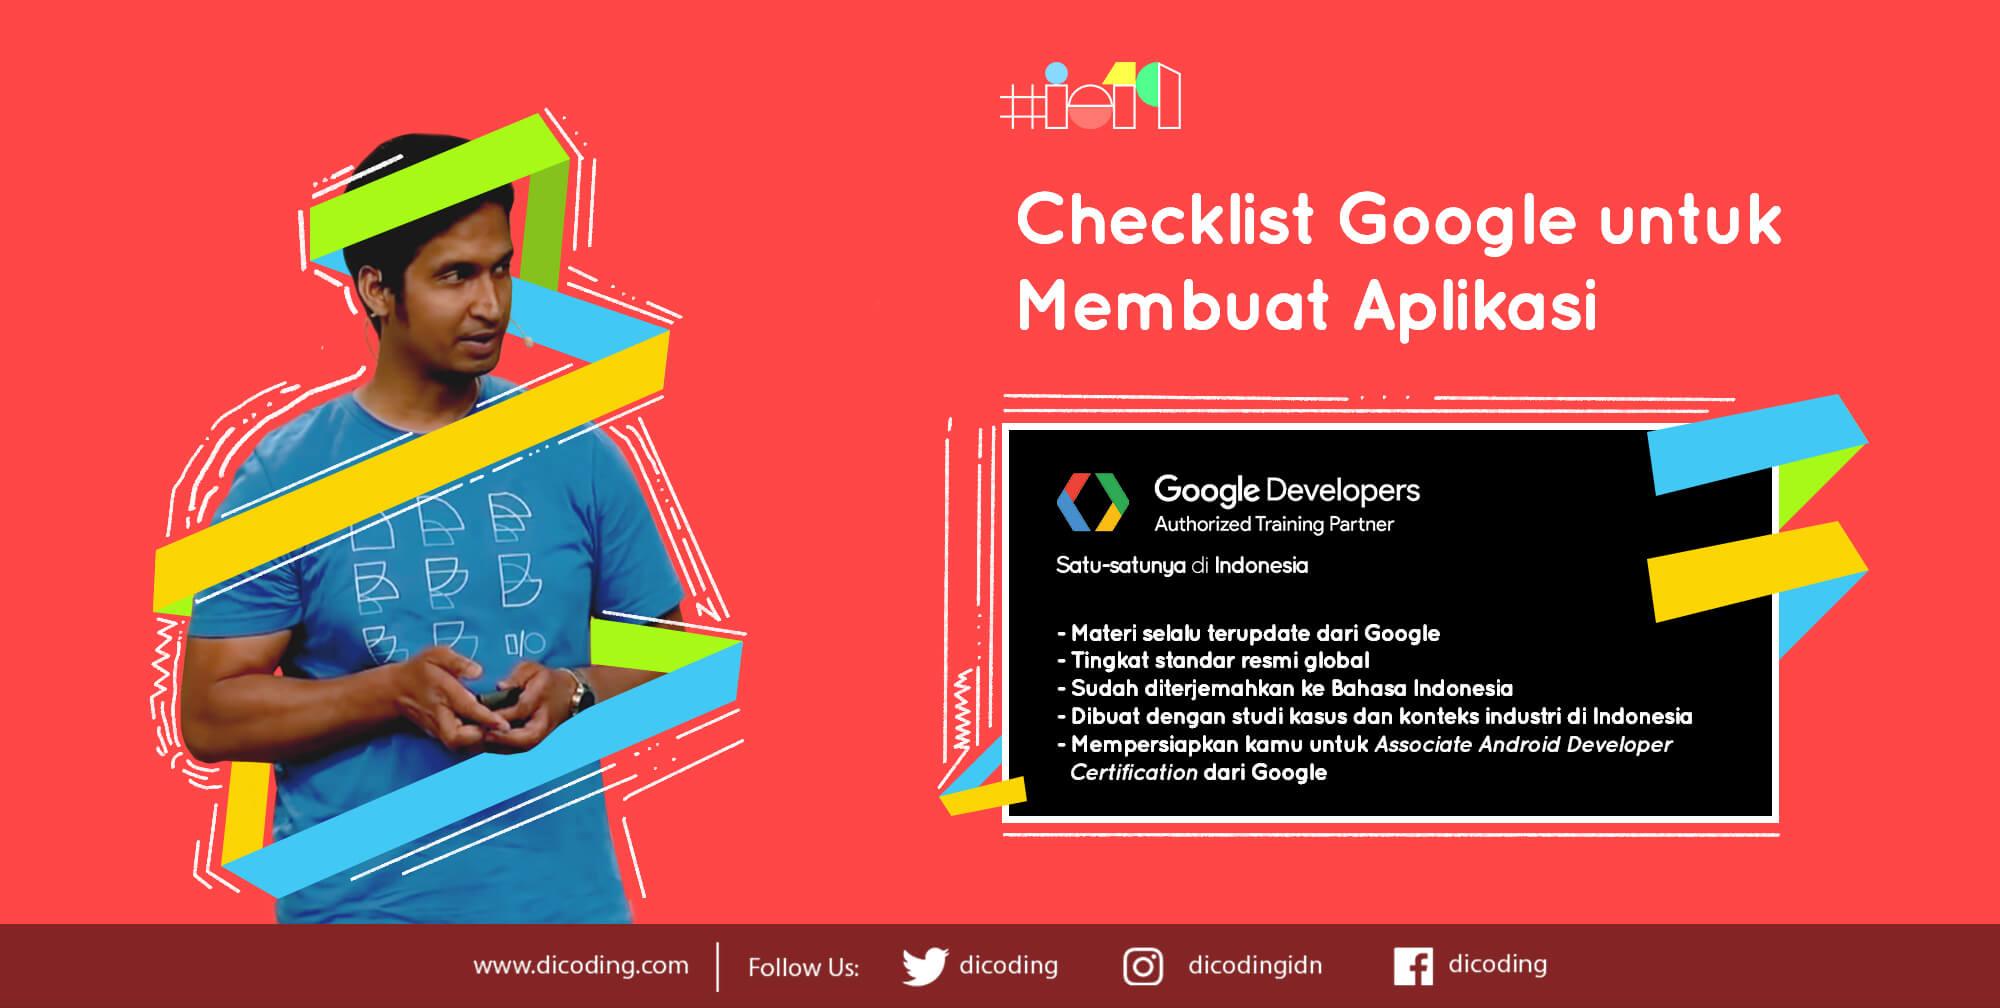 Checklist Google yang dibawakan pada Google I/O 2019